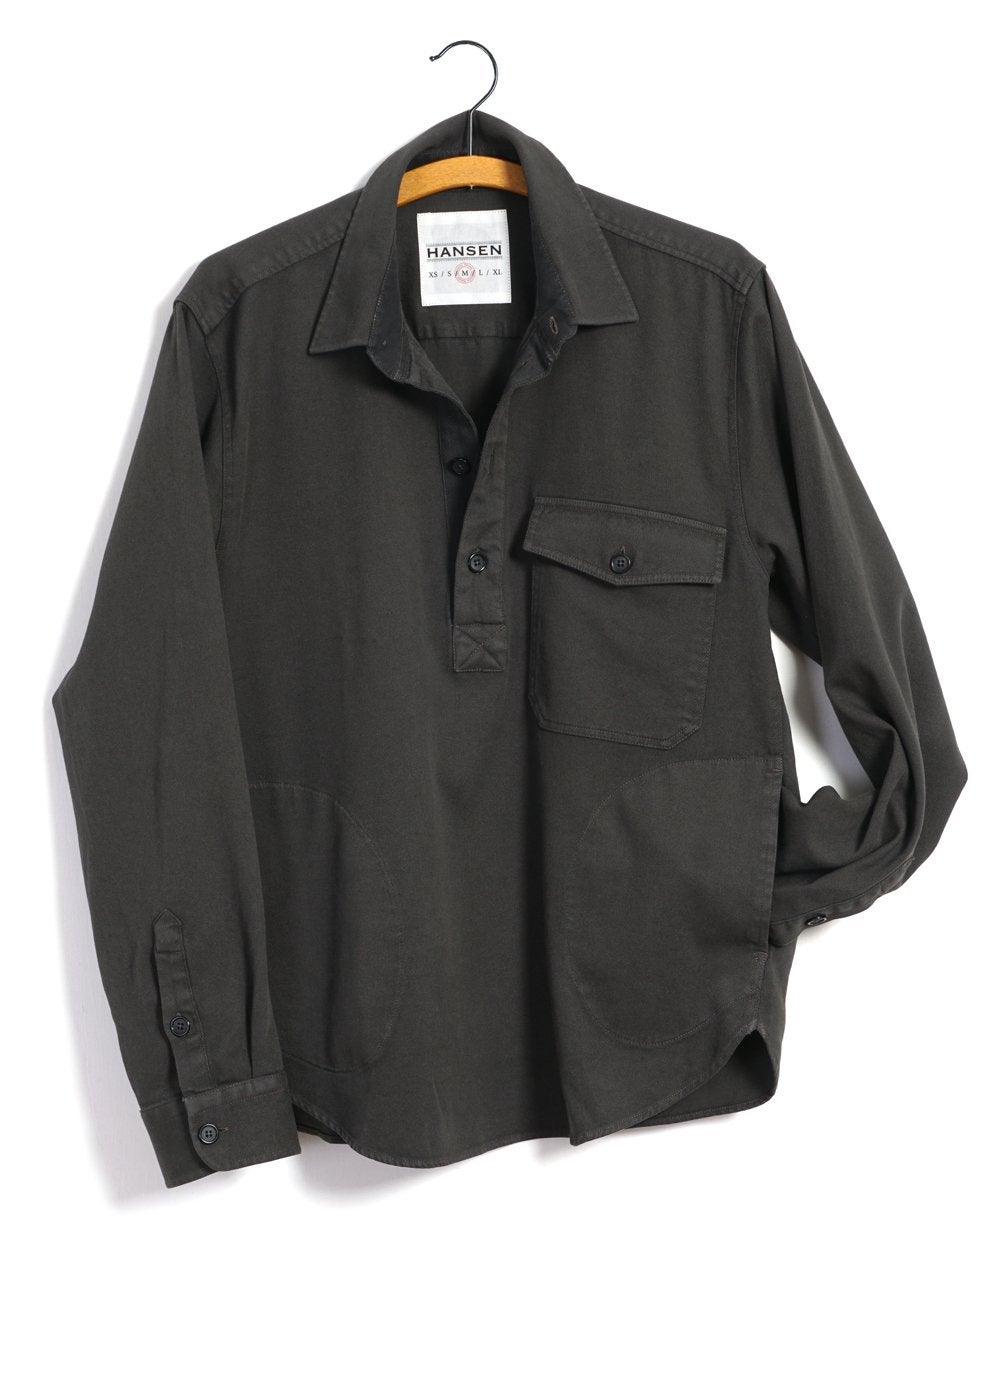 Hansen Garments ROBERT | Casual Pull-on Shirt | light grey, dark forrest